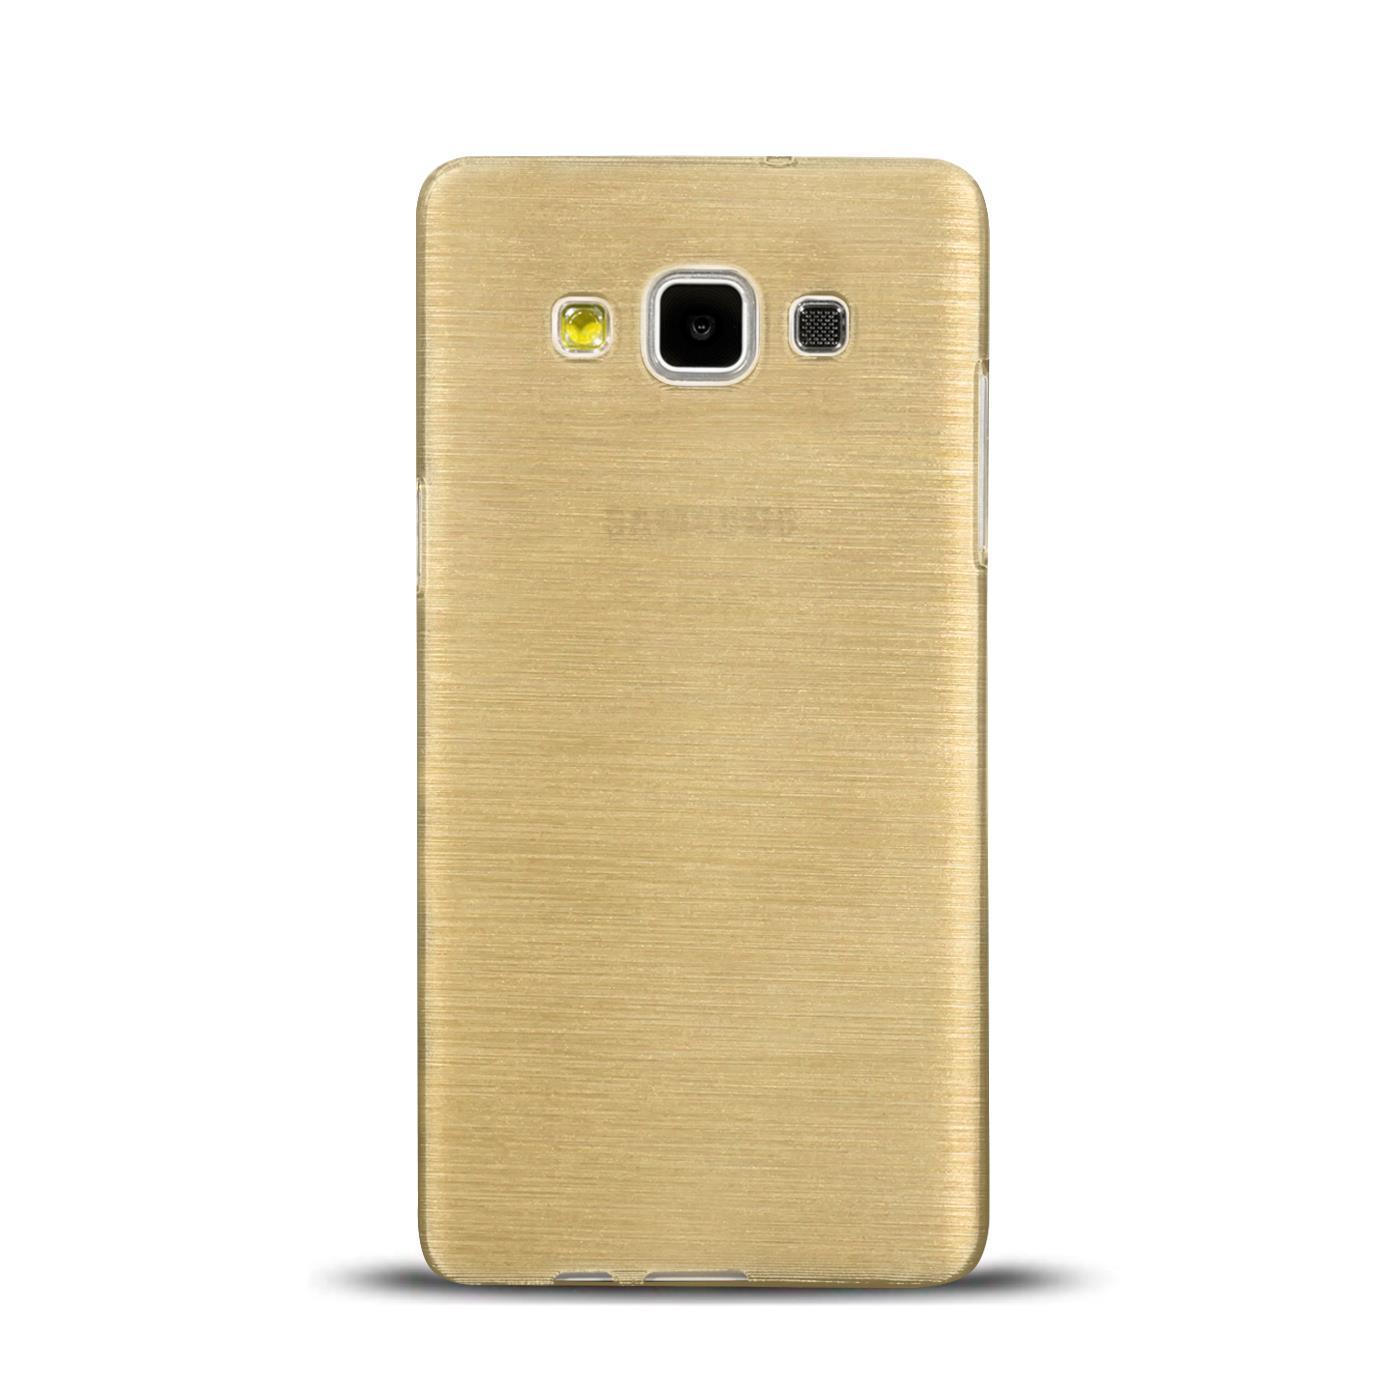 Silikon-Bumper-Case-Samsung-Galaxy-a5-2015-Ultra-Slim-Stossfeste-Rueckschale Indexbild 10